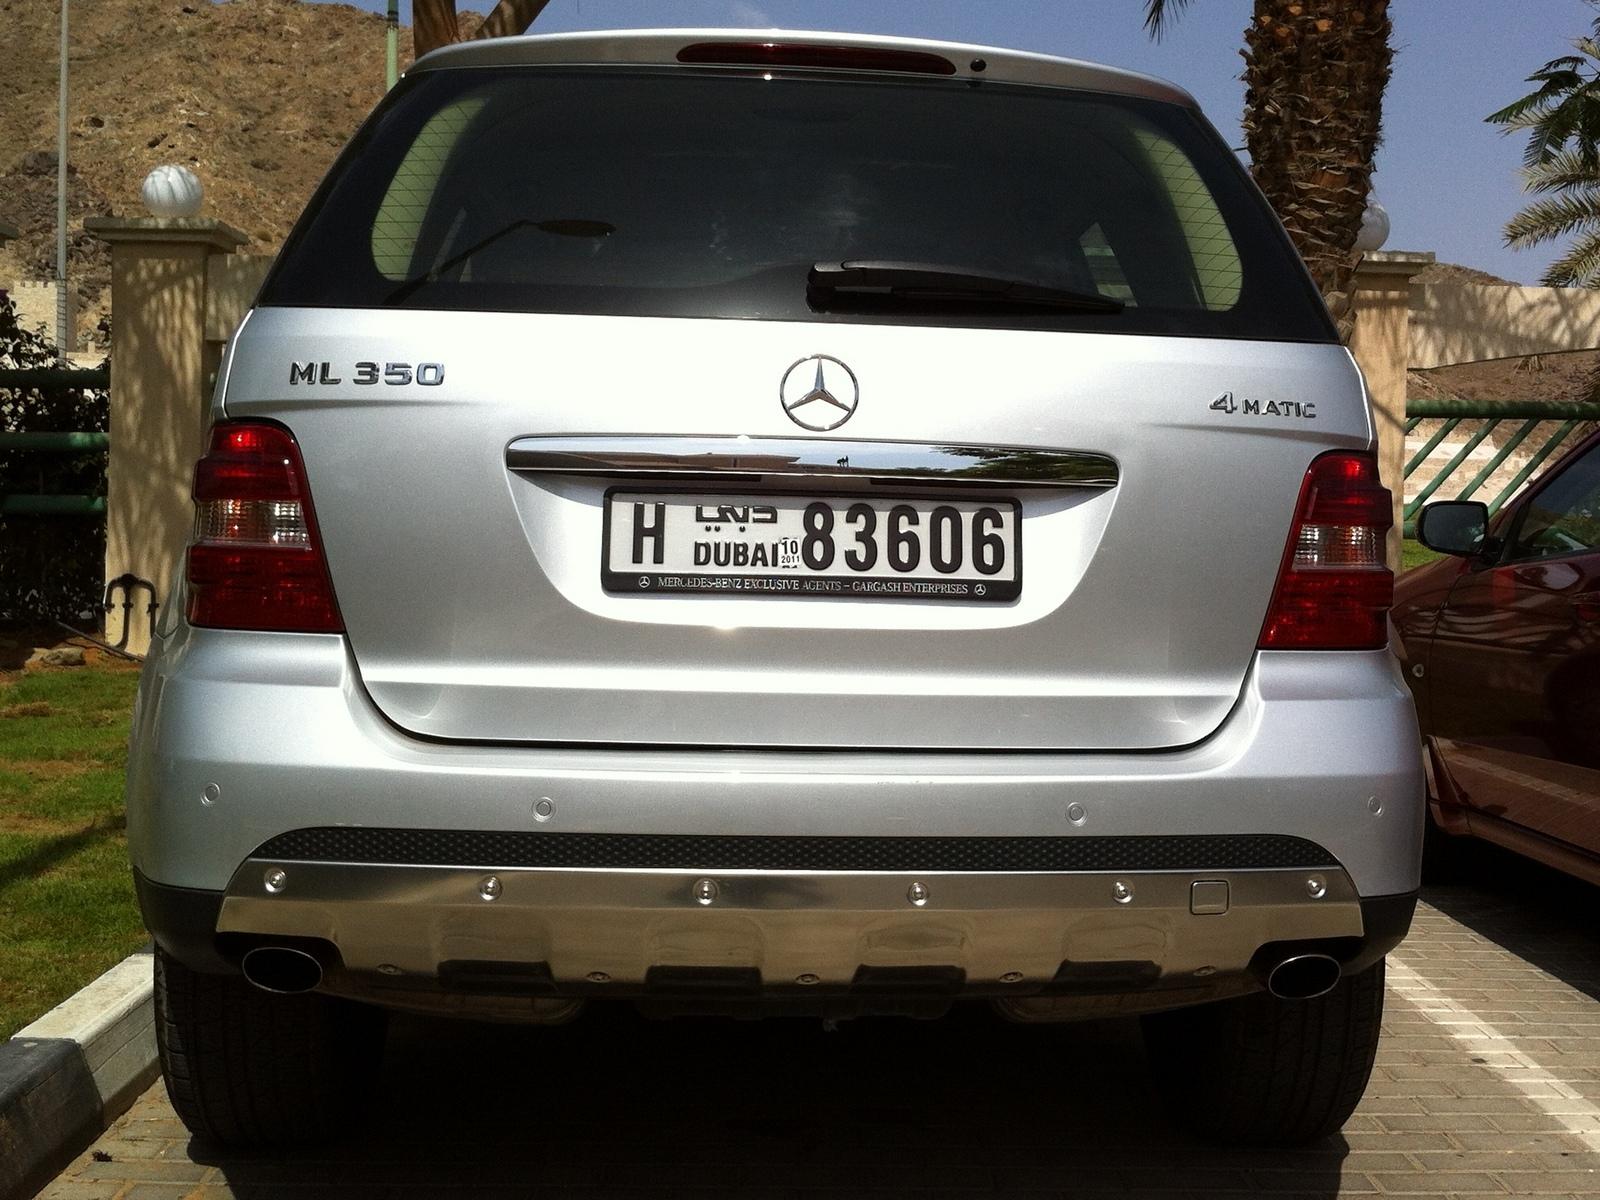 Vehicle Registration Plates Of Bmw X6 Amp Mercedes Ml Dubai